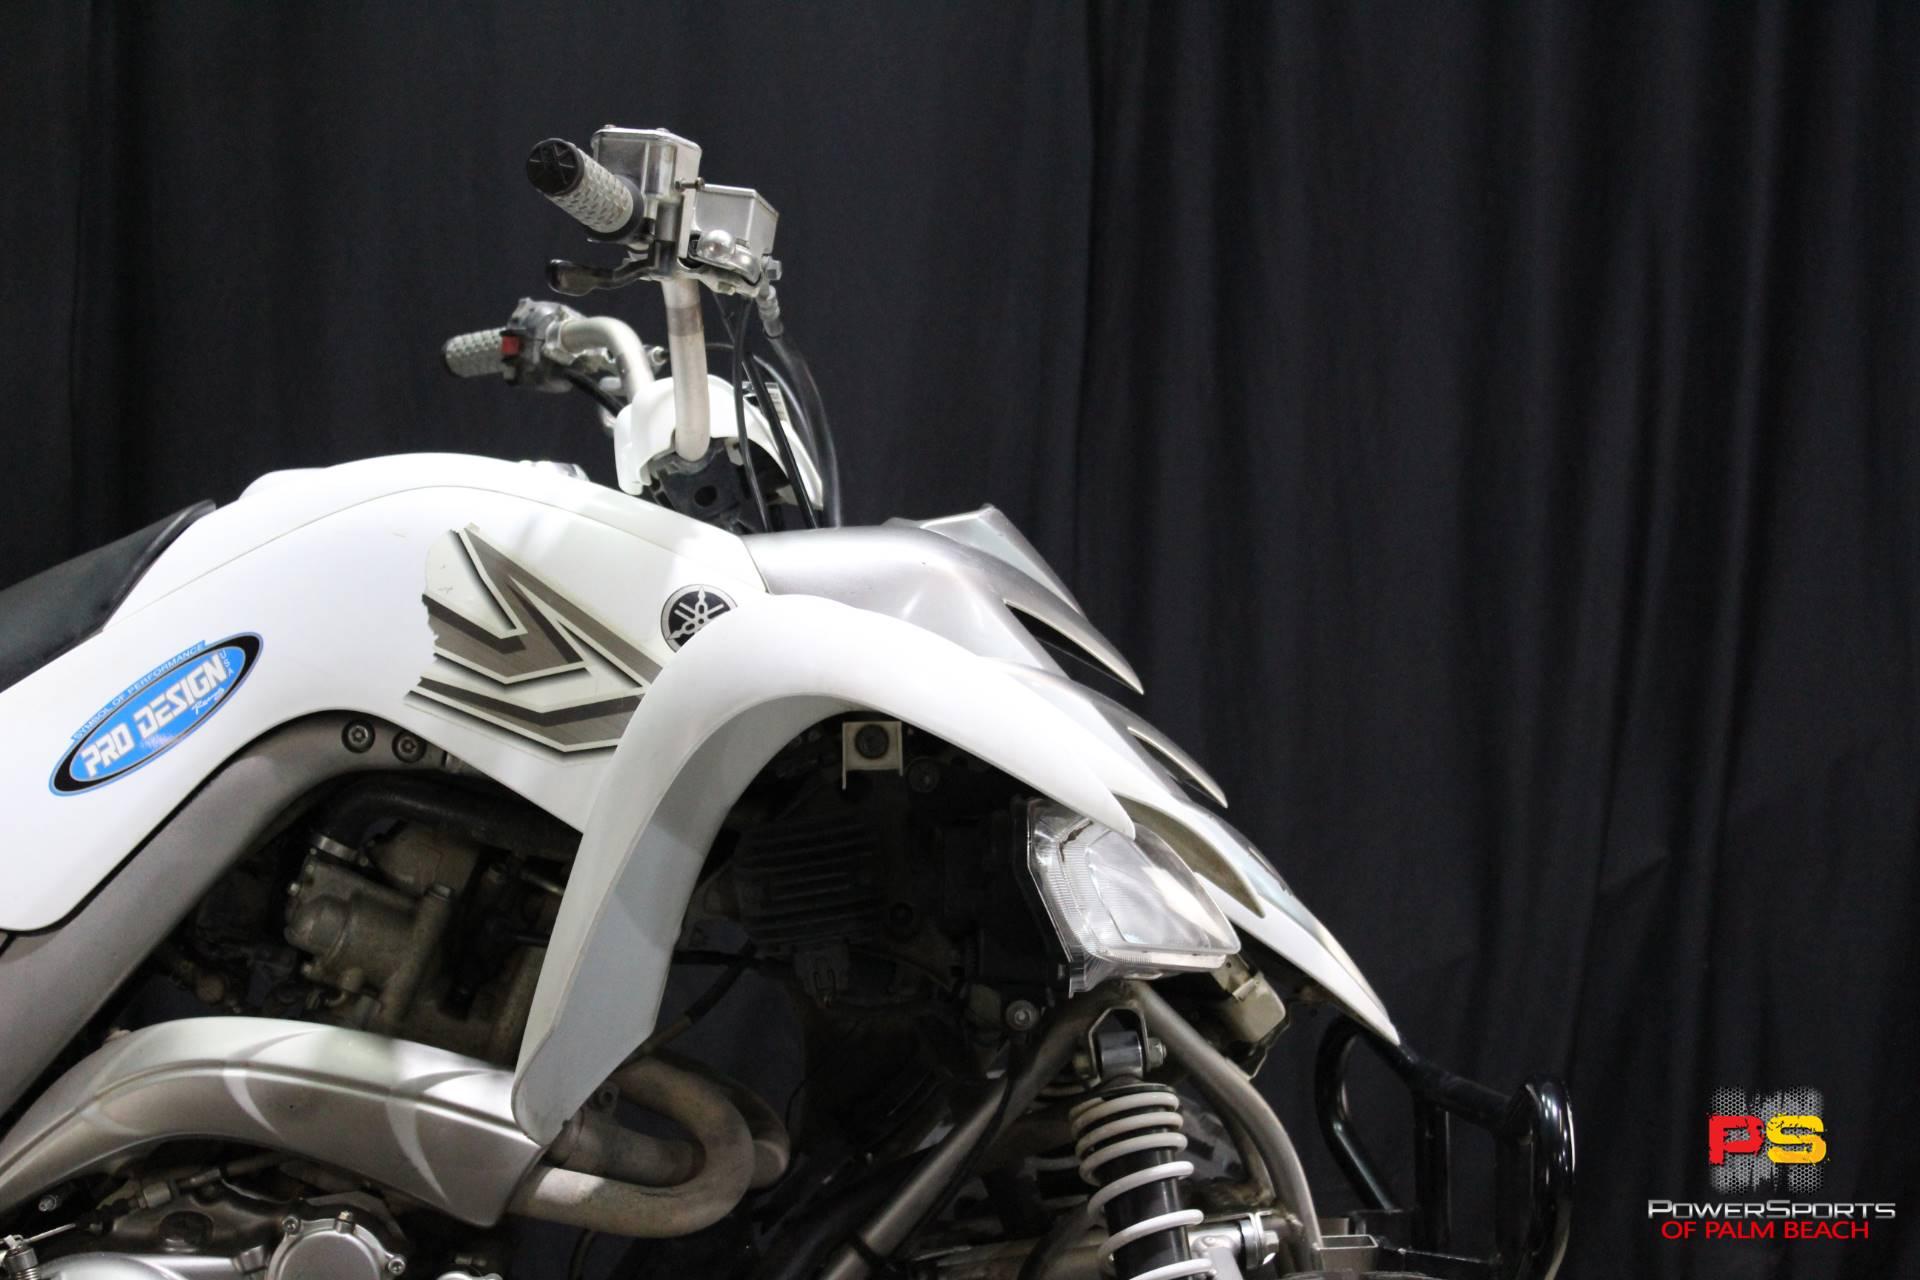 2006 Yamaha Raptor 700R 7